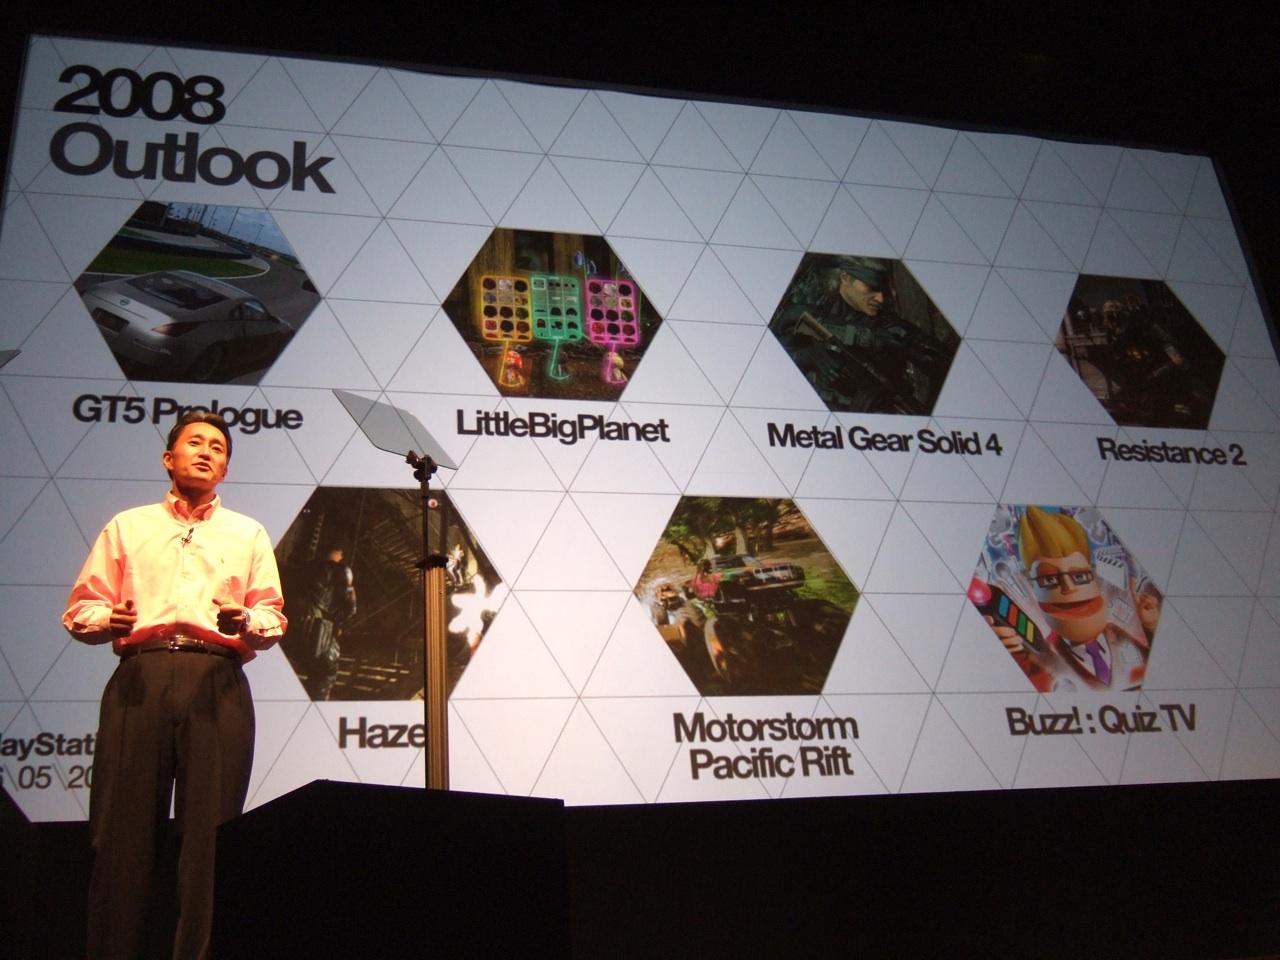 Neuer Chef für Sonys PlayStation-Entwicklerstudios - SCEI-Chef Kaz Hirai auf dem PlayStation Day am 6. Mai 2008 in London